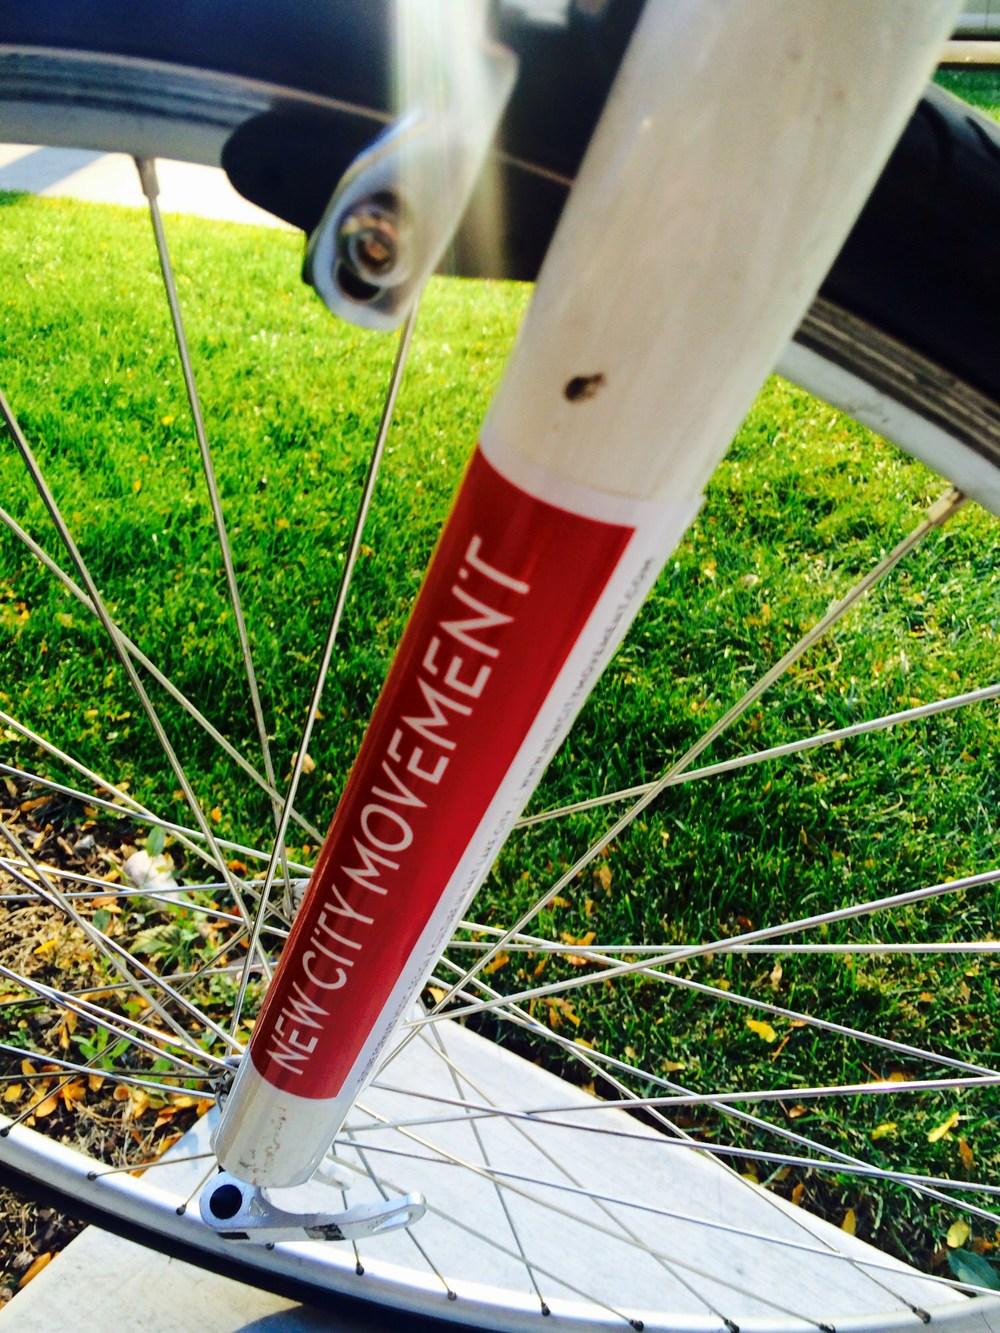 new-city-movement-sticker-bike